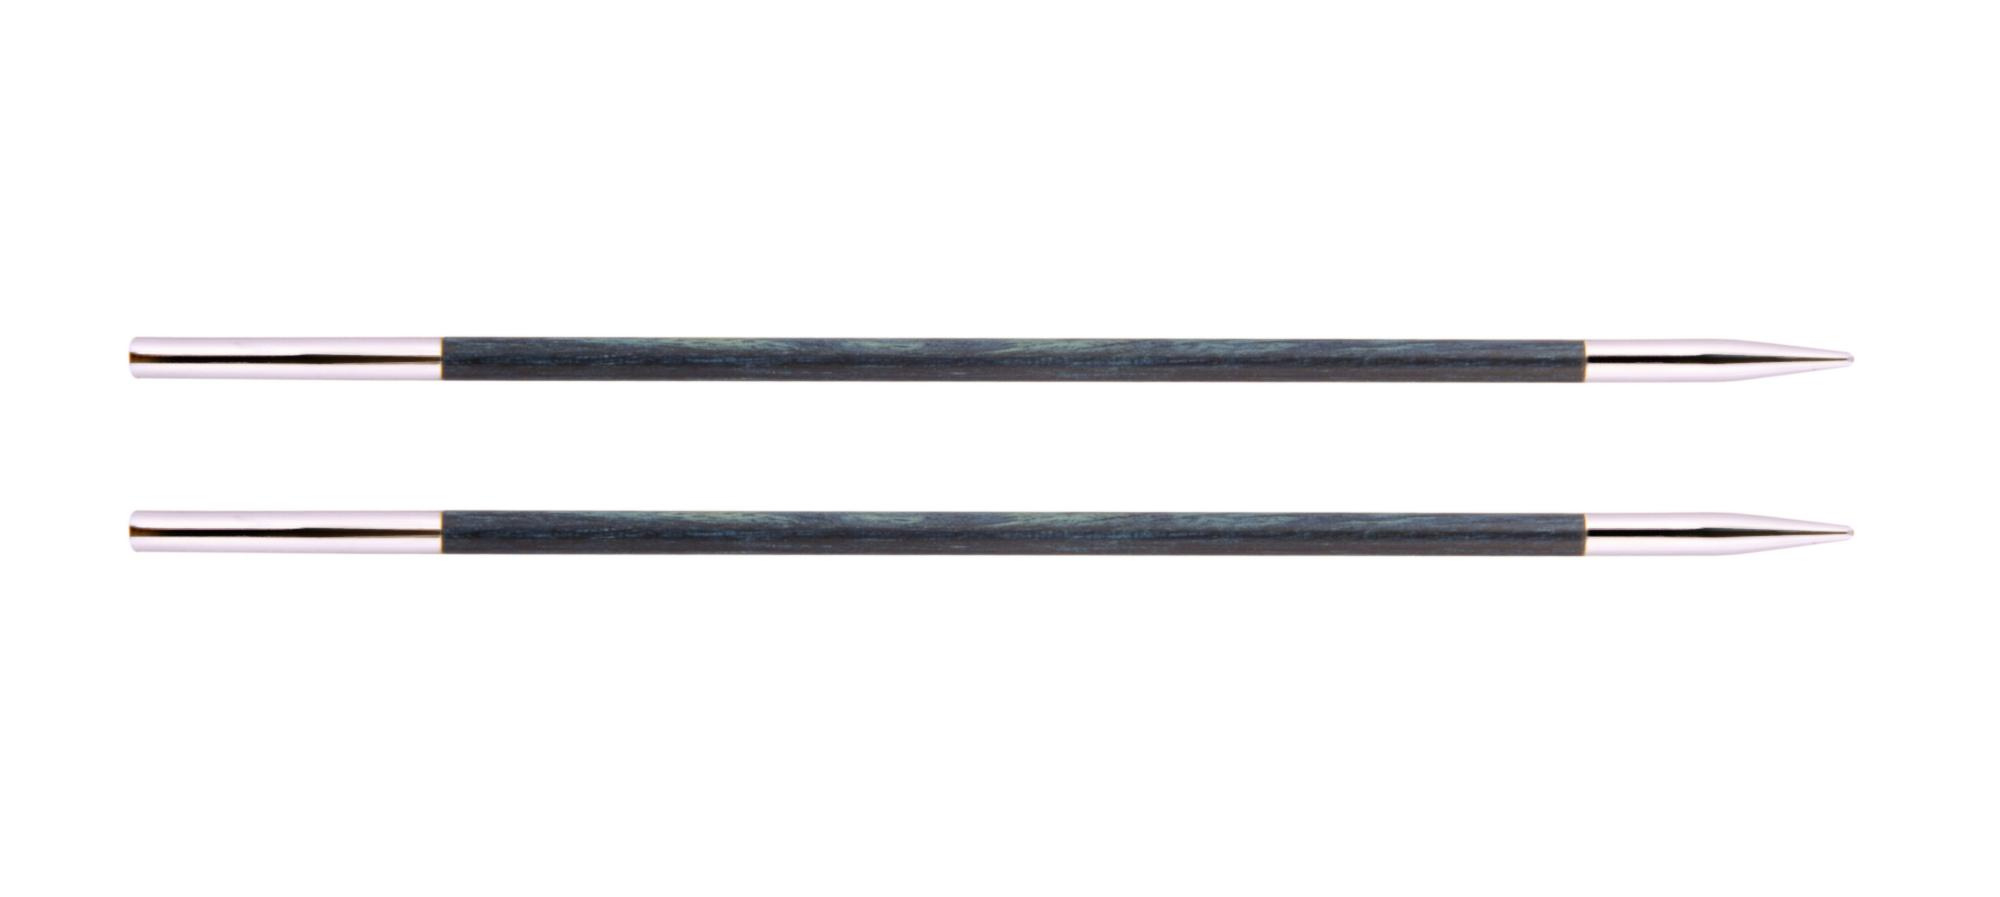 Спицы съемные Royale KnitPro, 29252, 3.25 мм